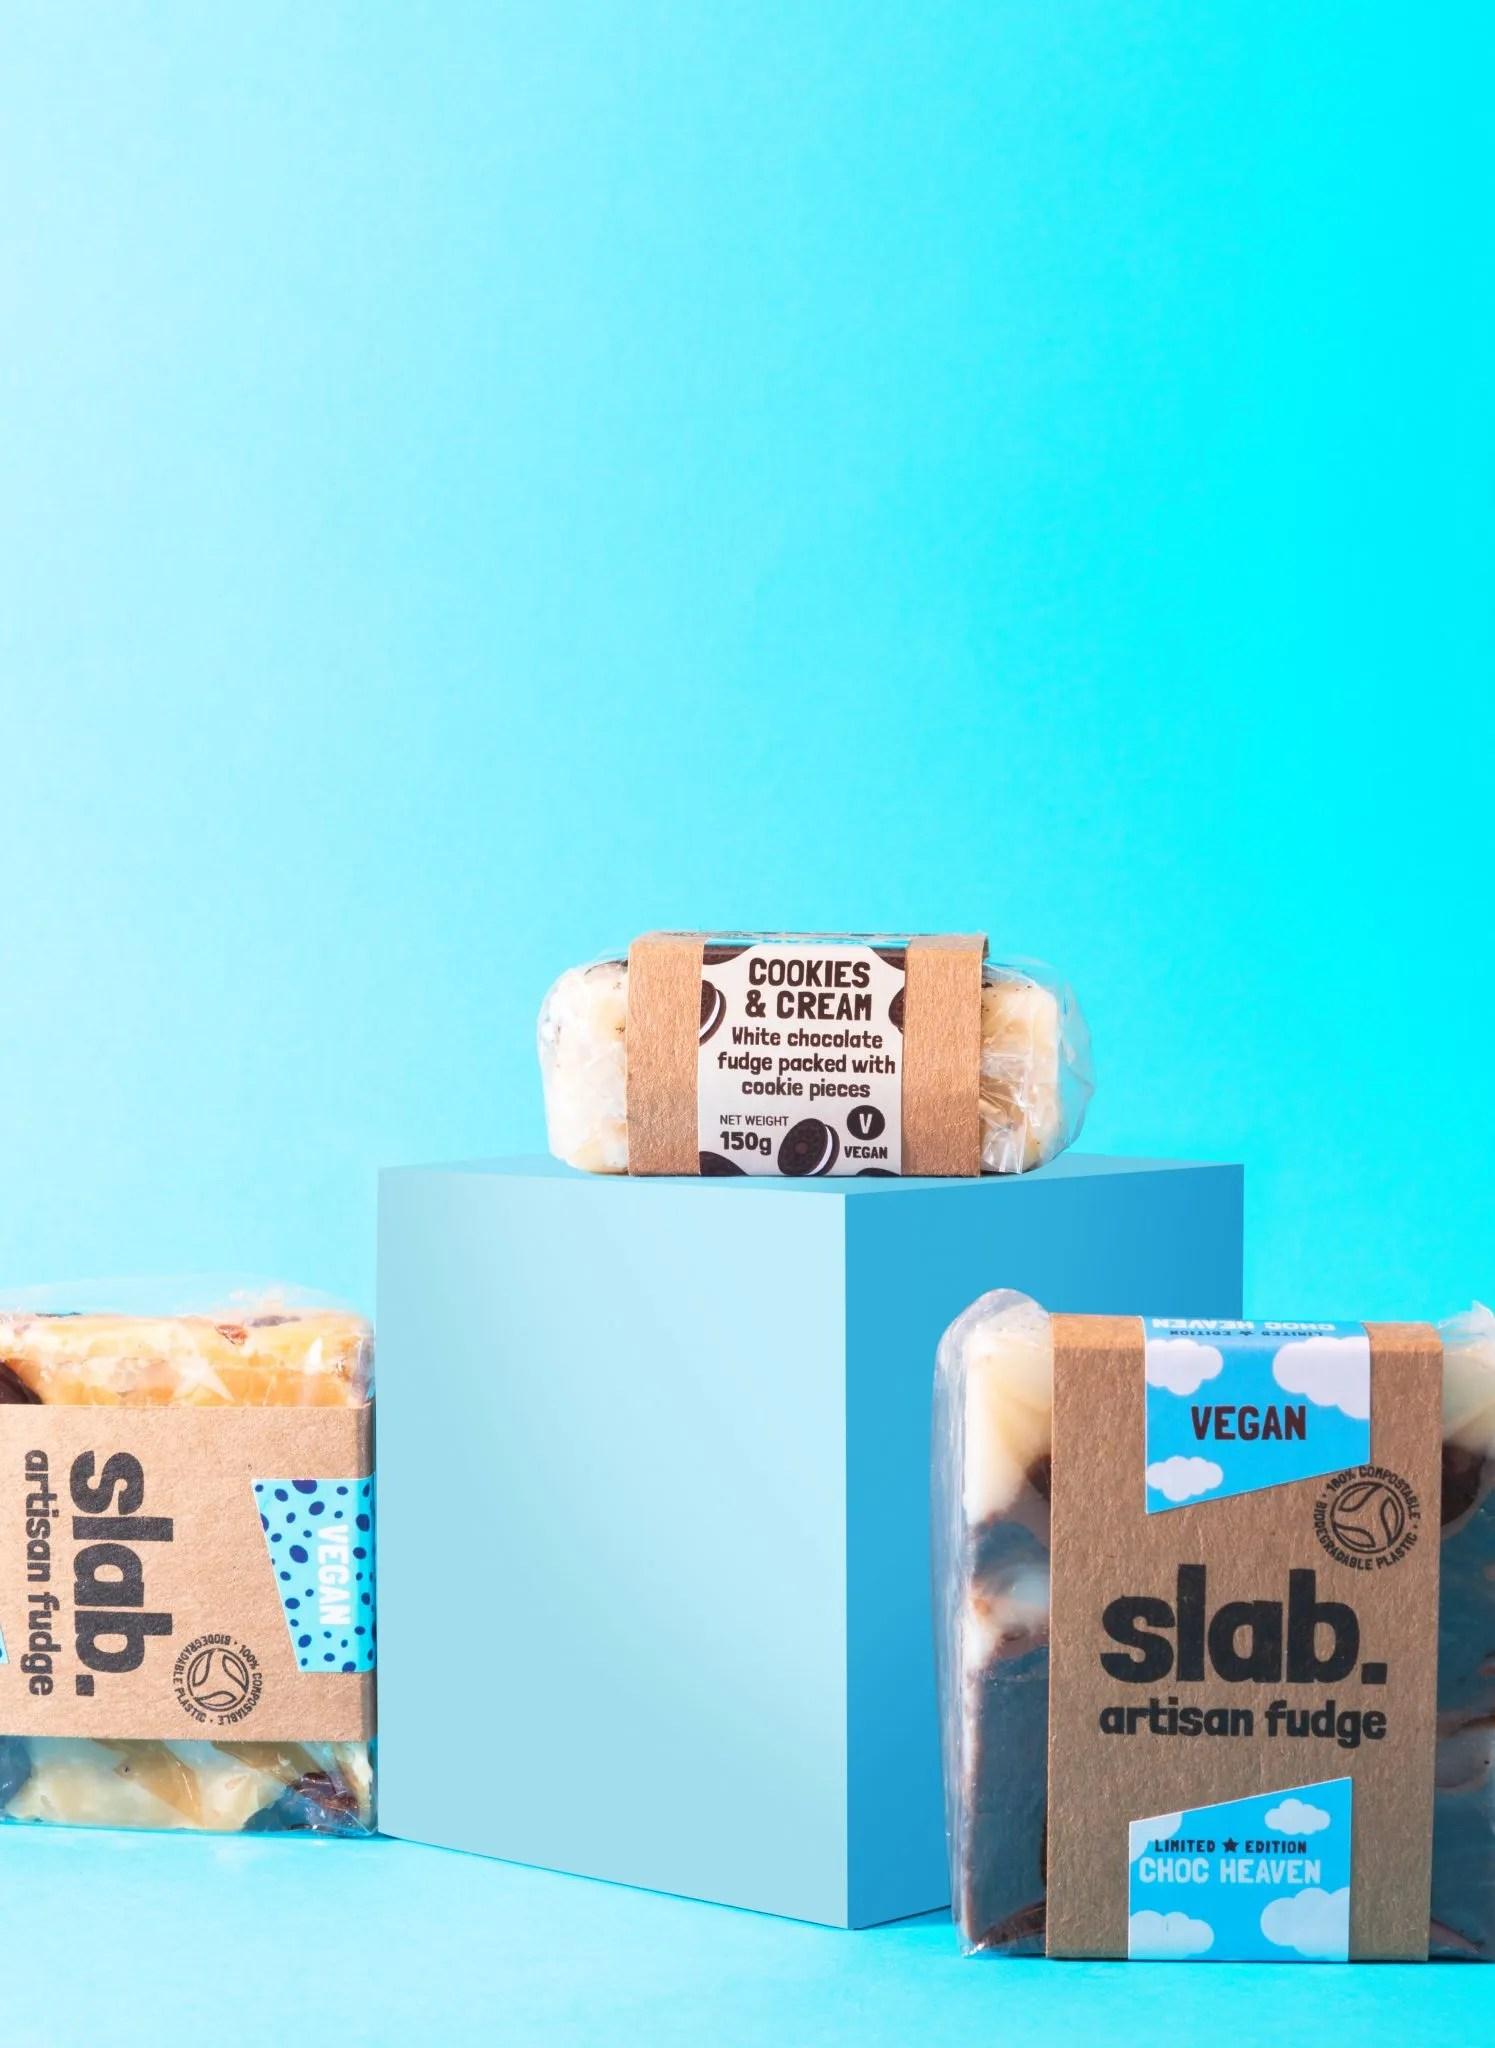 Slab Artisan Fudge Creative Photo - Vegan Stand